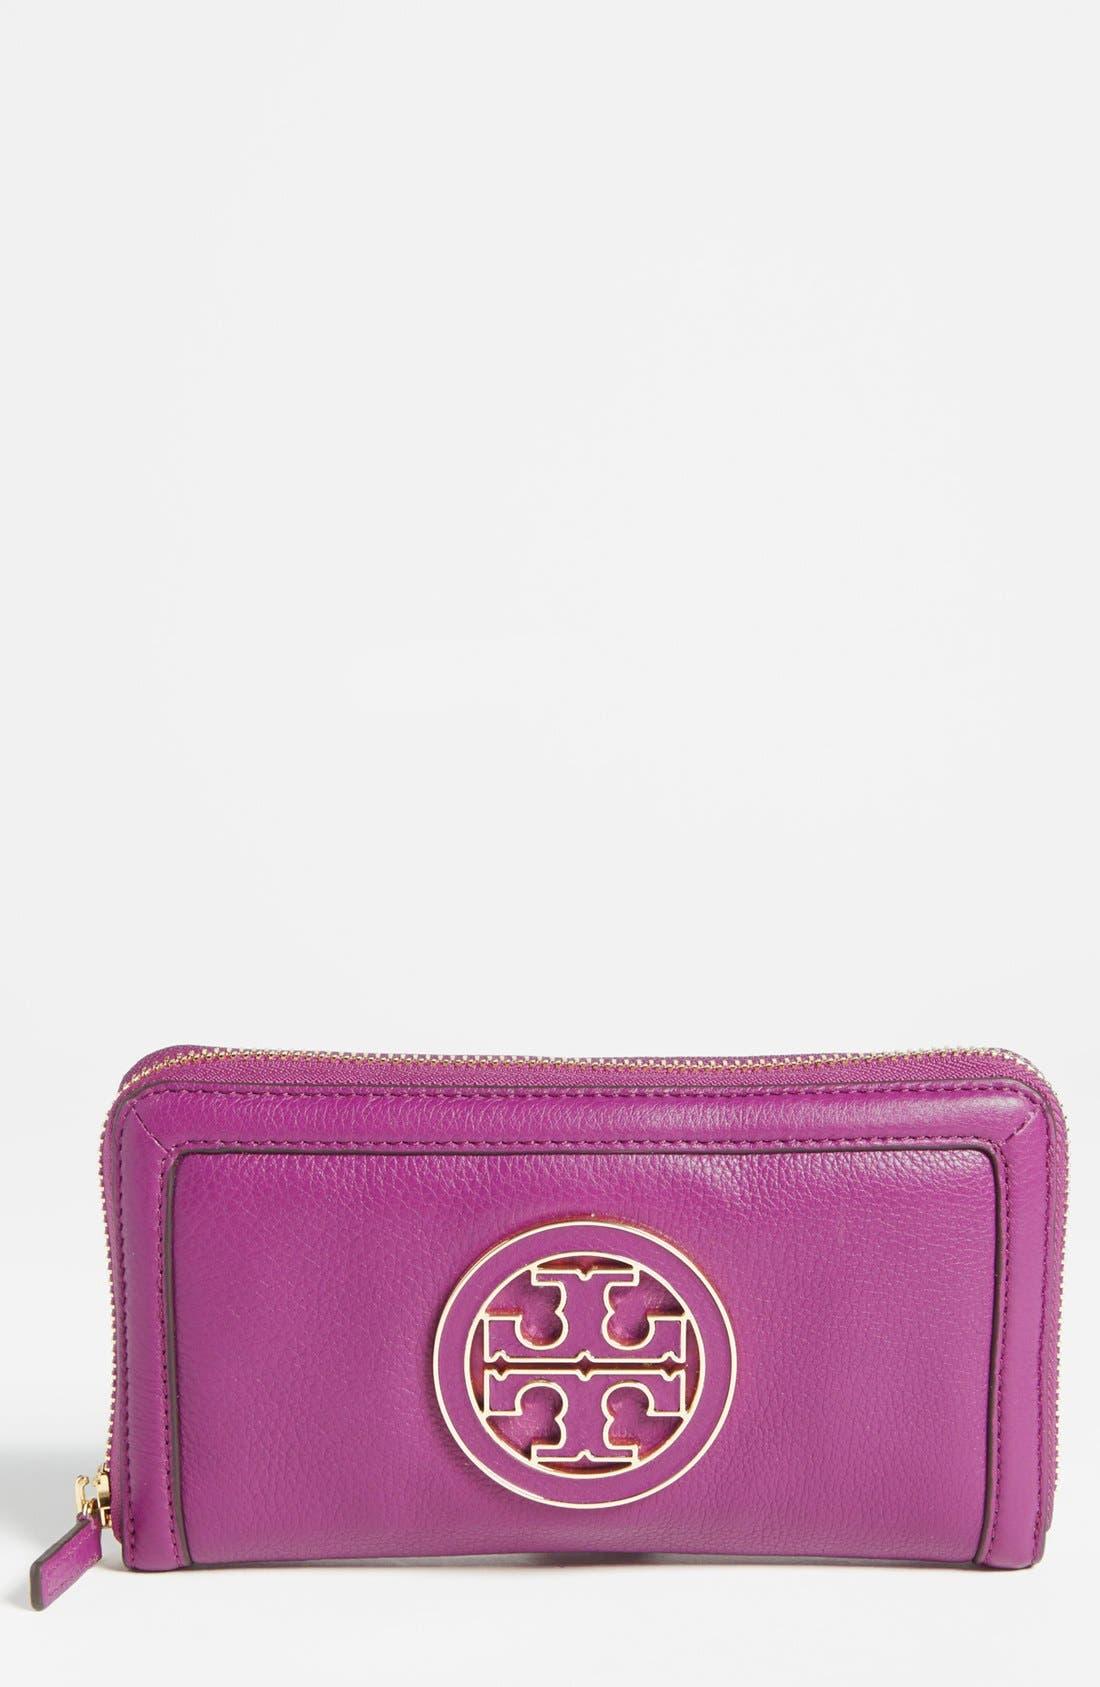 Alternate Image 1 Selected - Tory Burch 'Amanda' Continental Wallet